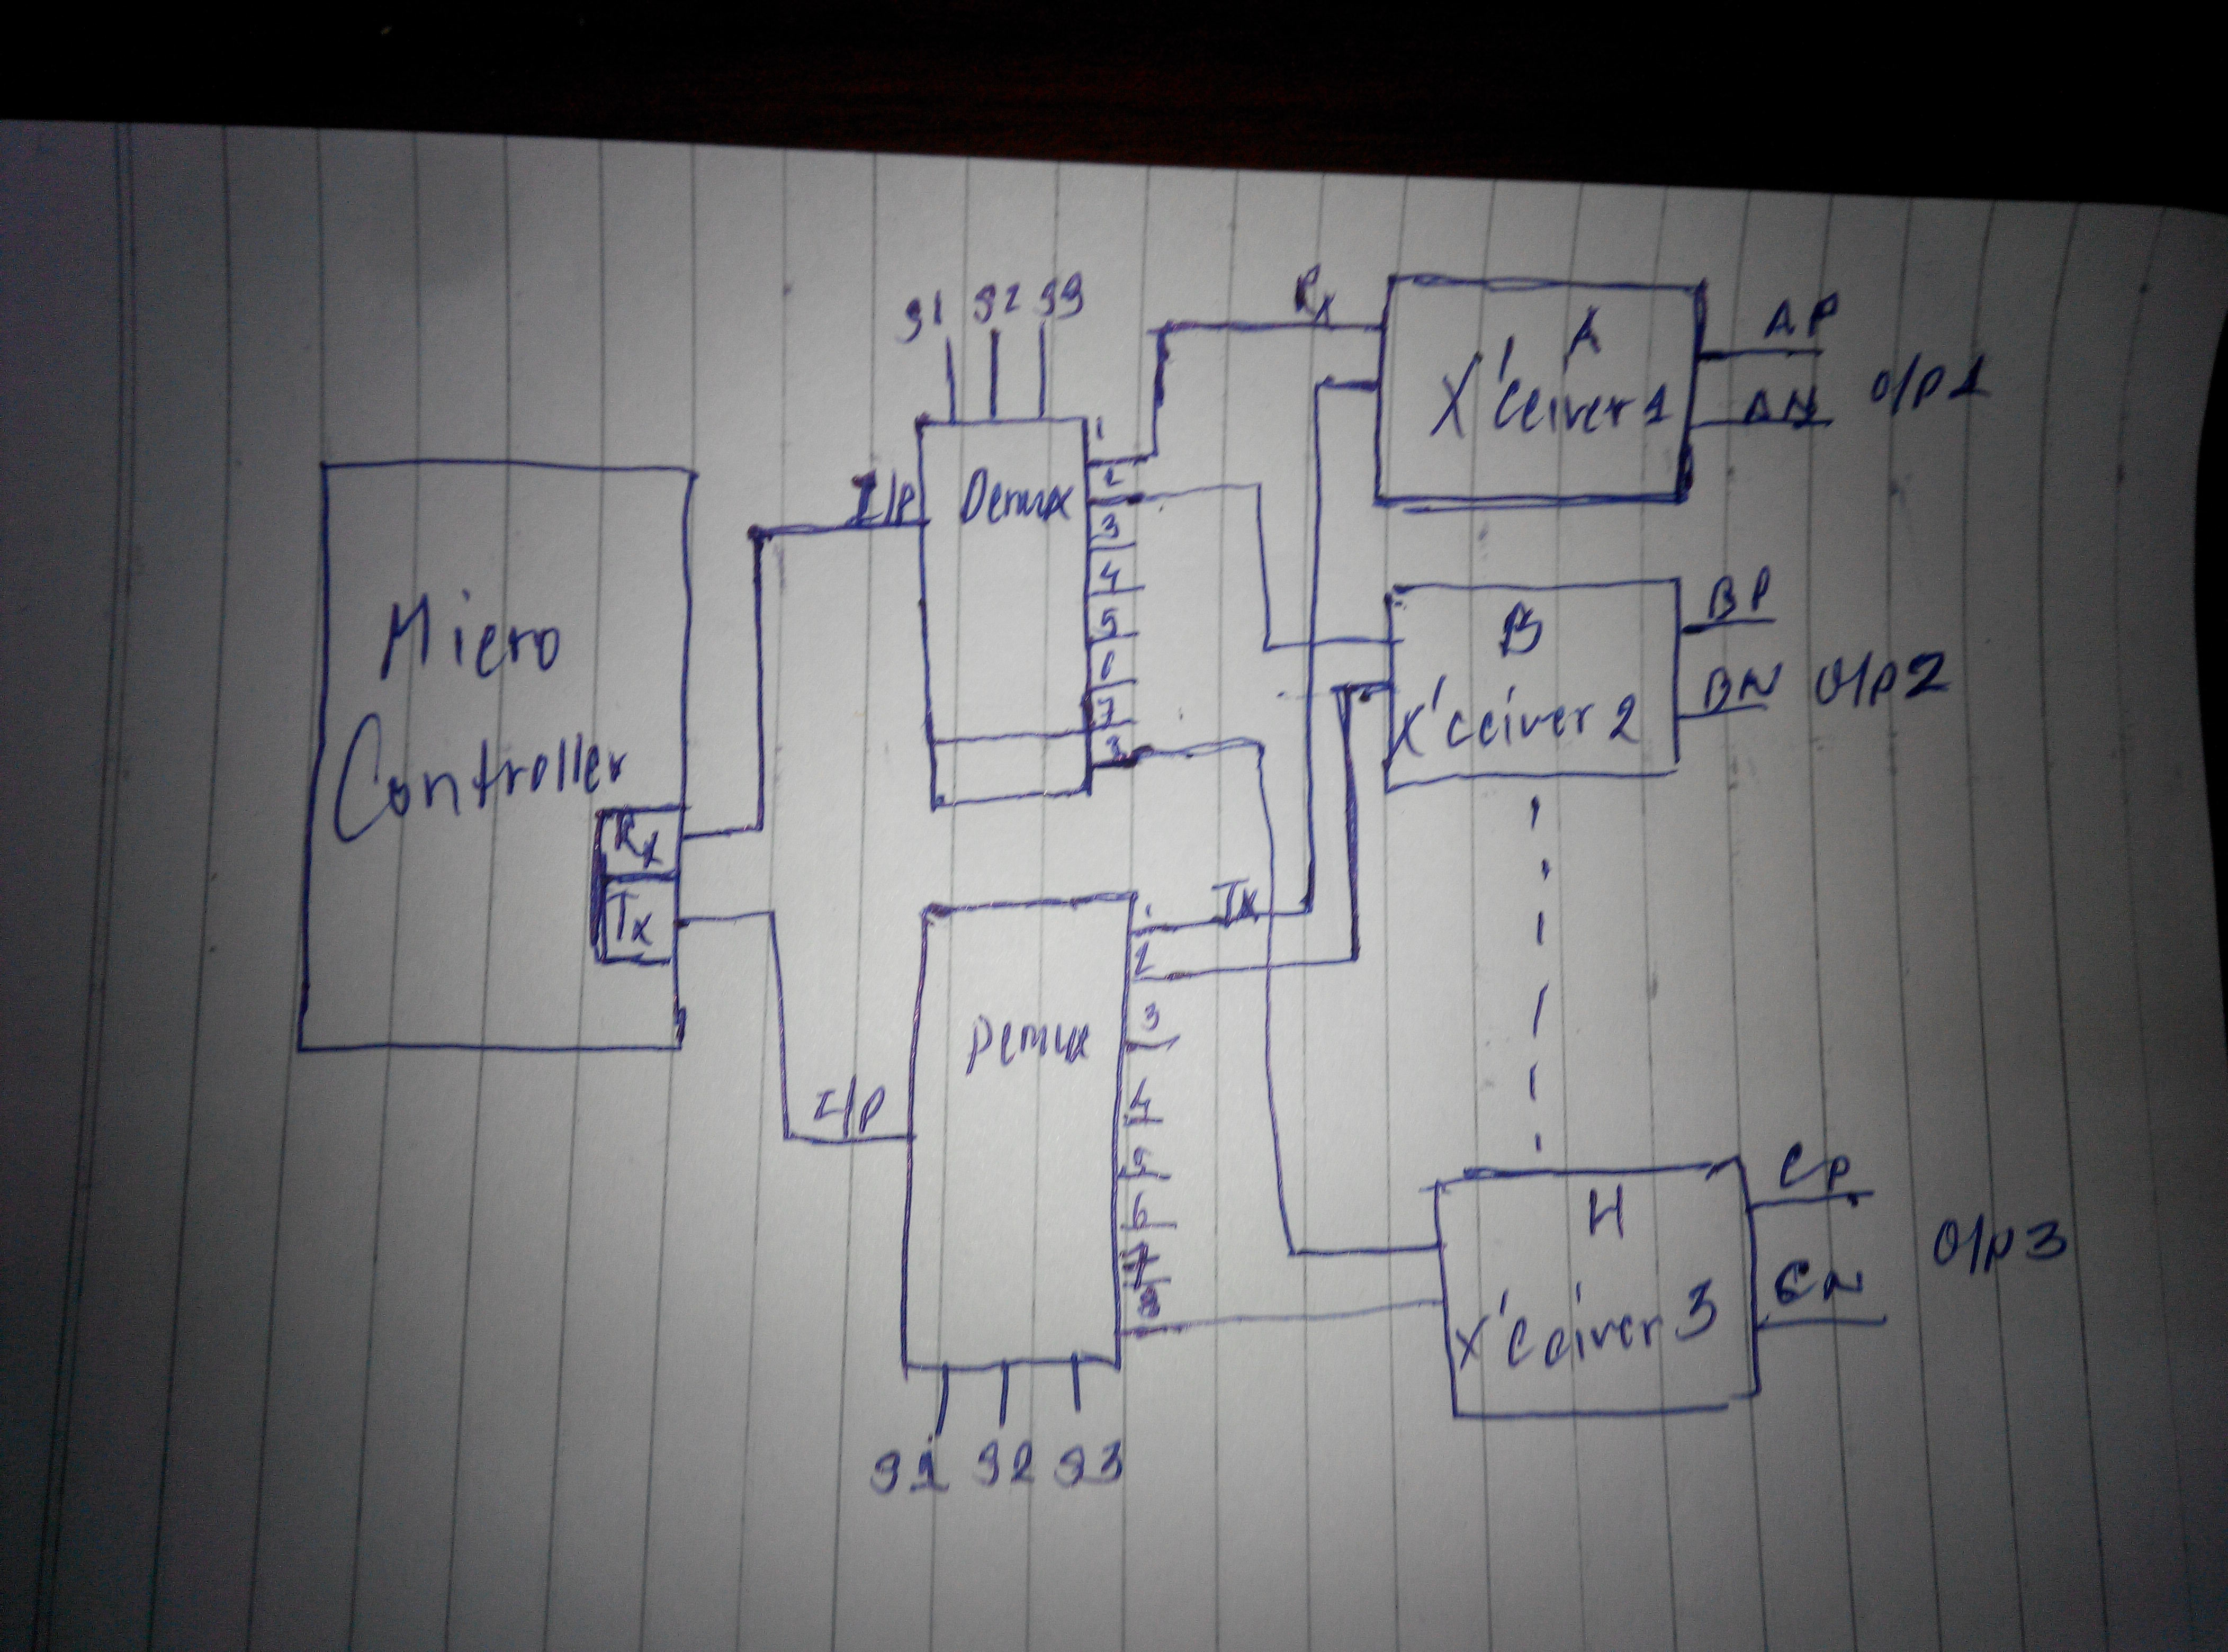 Ice Maker Problems 8 Kenmore Refrigerator Wiring Diagram Emprendedor